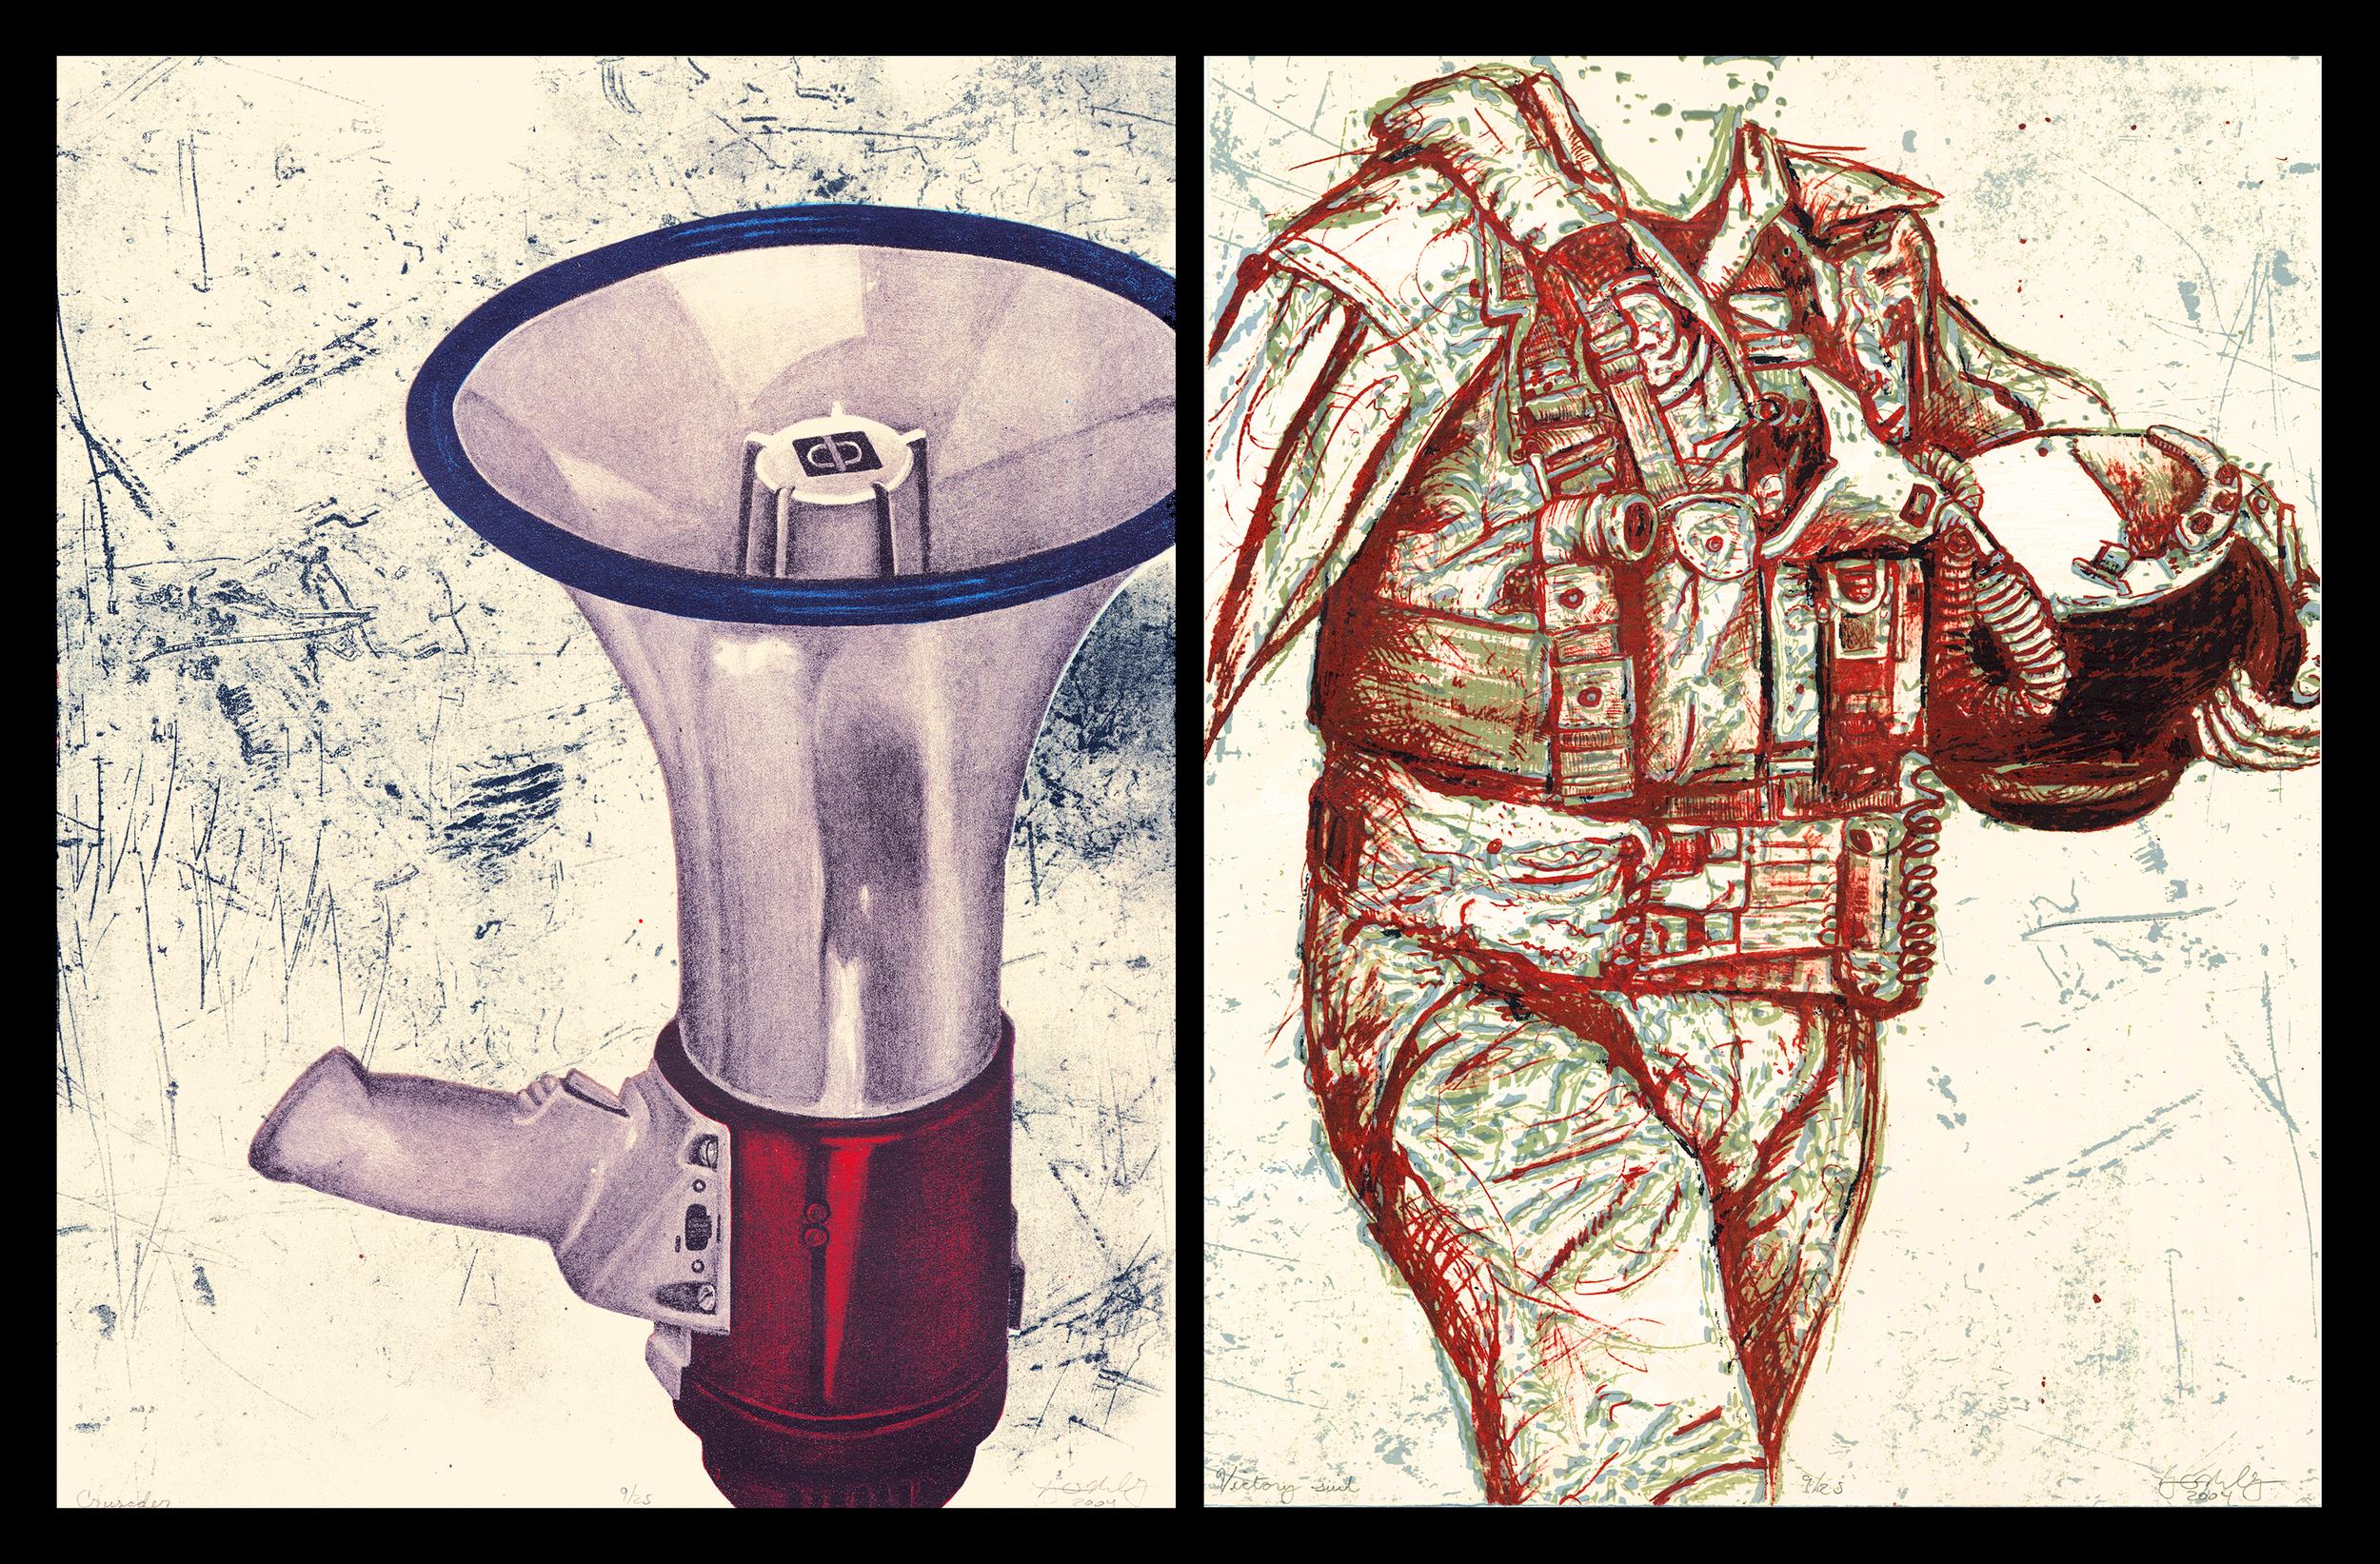 Crusader/Victory Suit: Language of Deceit